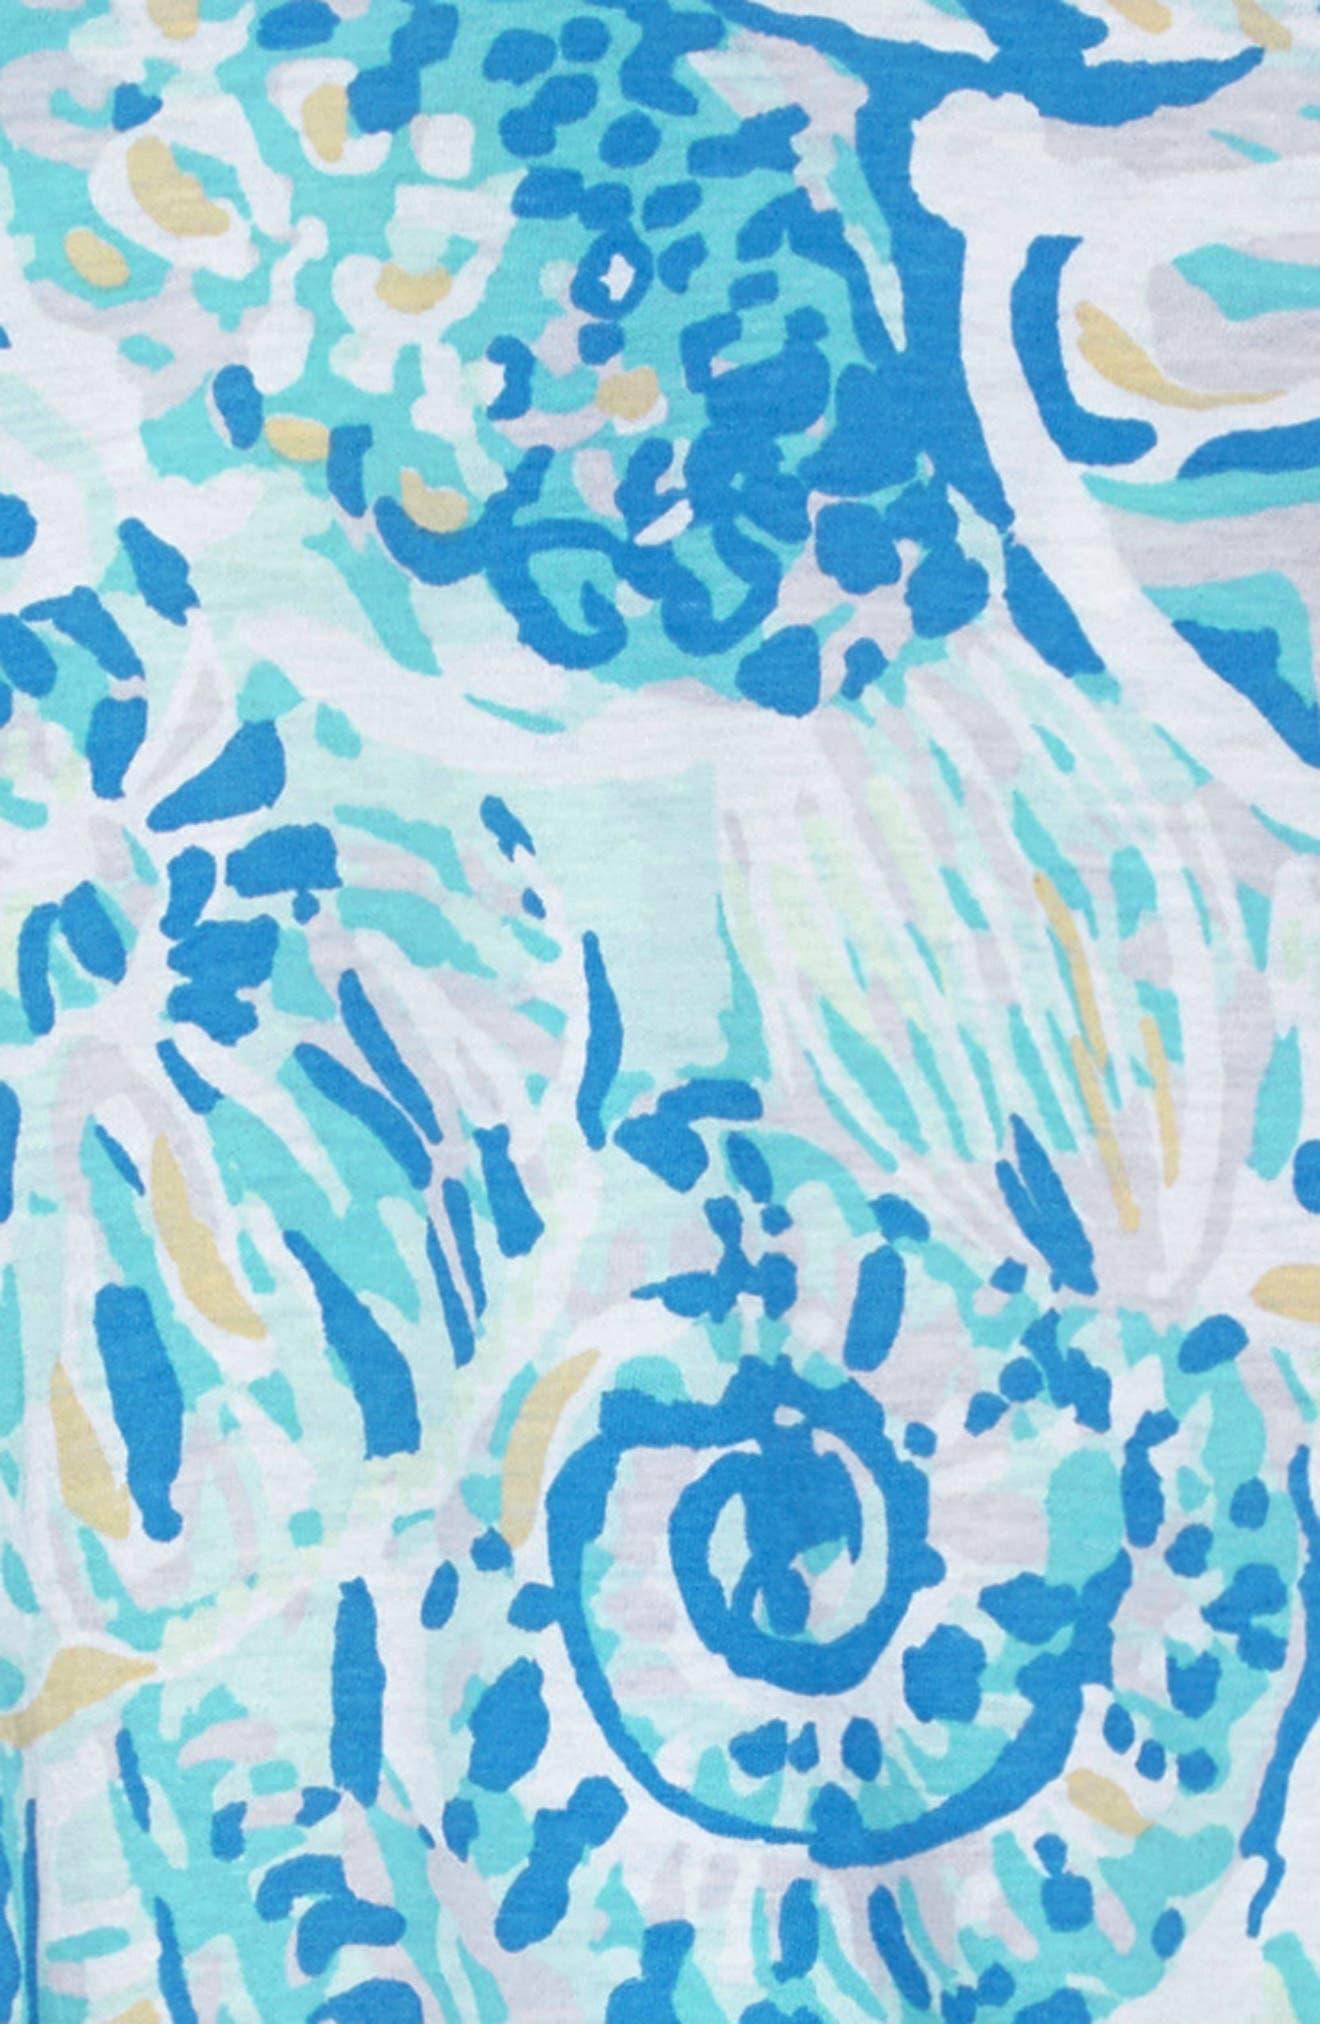 Mini Lindell Ruffle Dress,                             Alternate thumbnail 3, color,                             BENNET BLUE SALTY SEAS